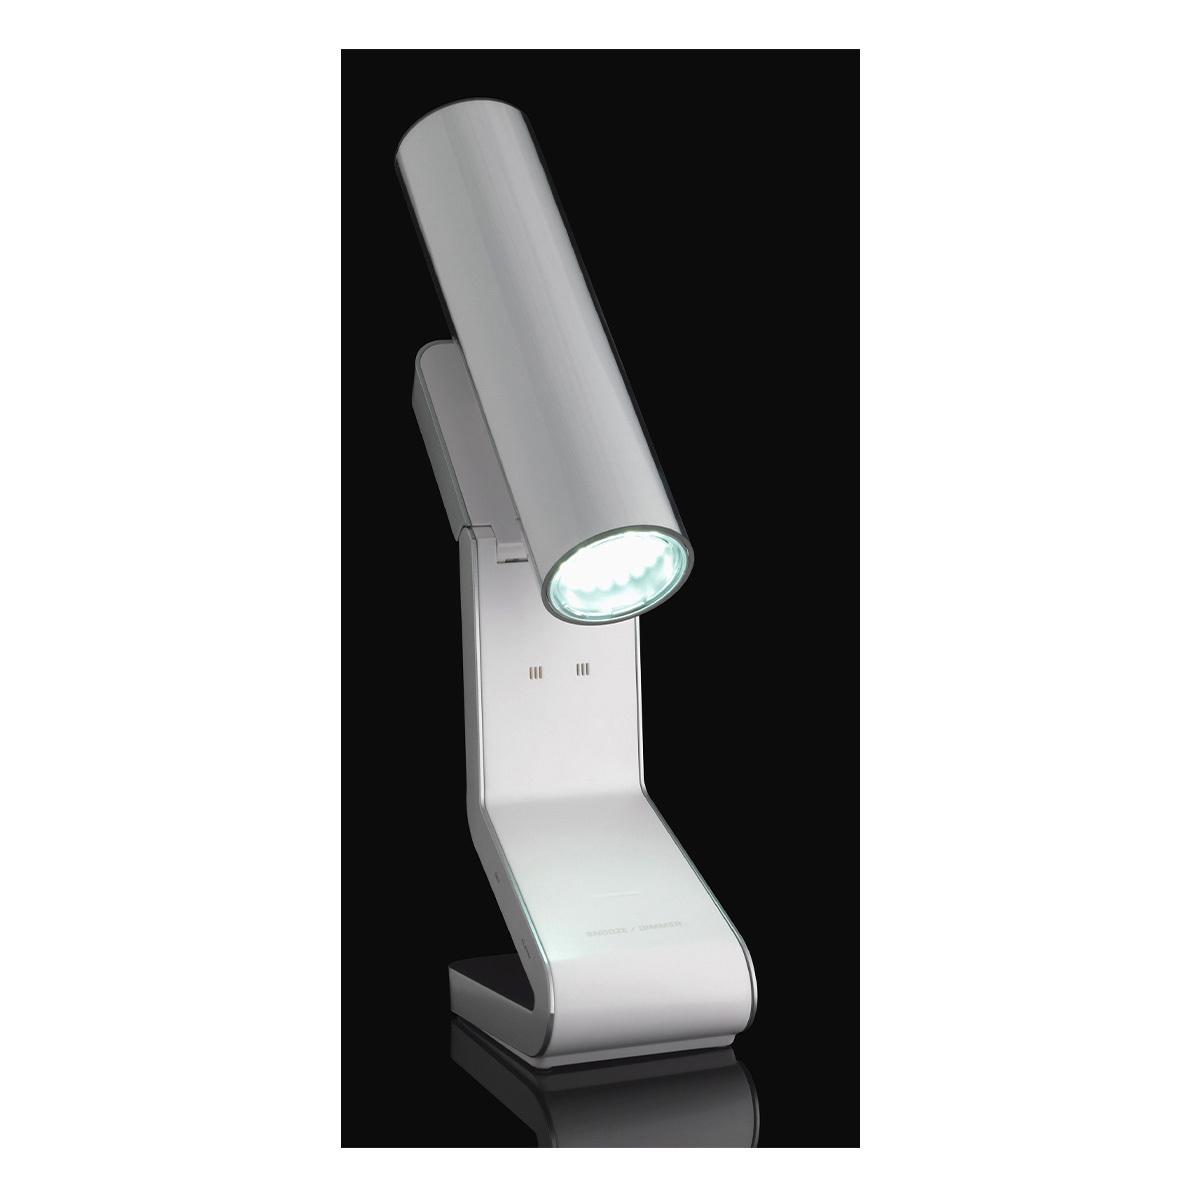 60-5004-led-lampe-mit-funk-projektions-wecker-light-tube-anwendung1-1200x1200px.jpg